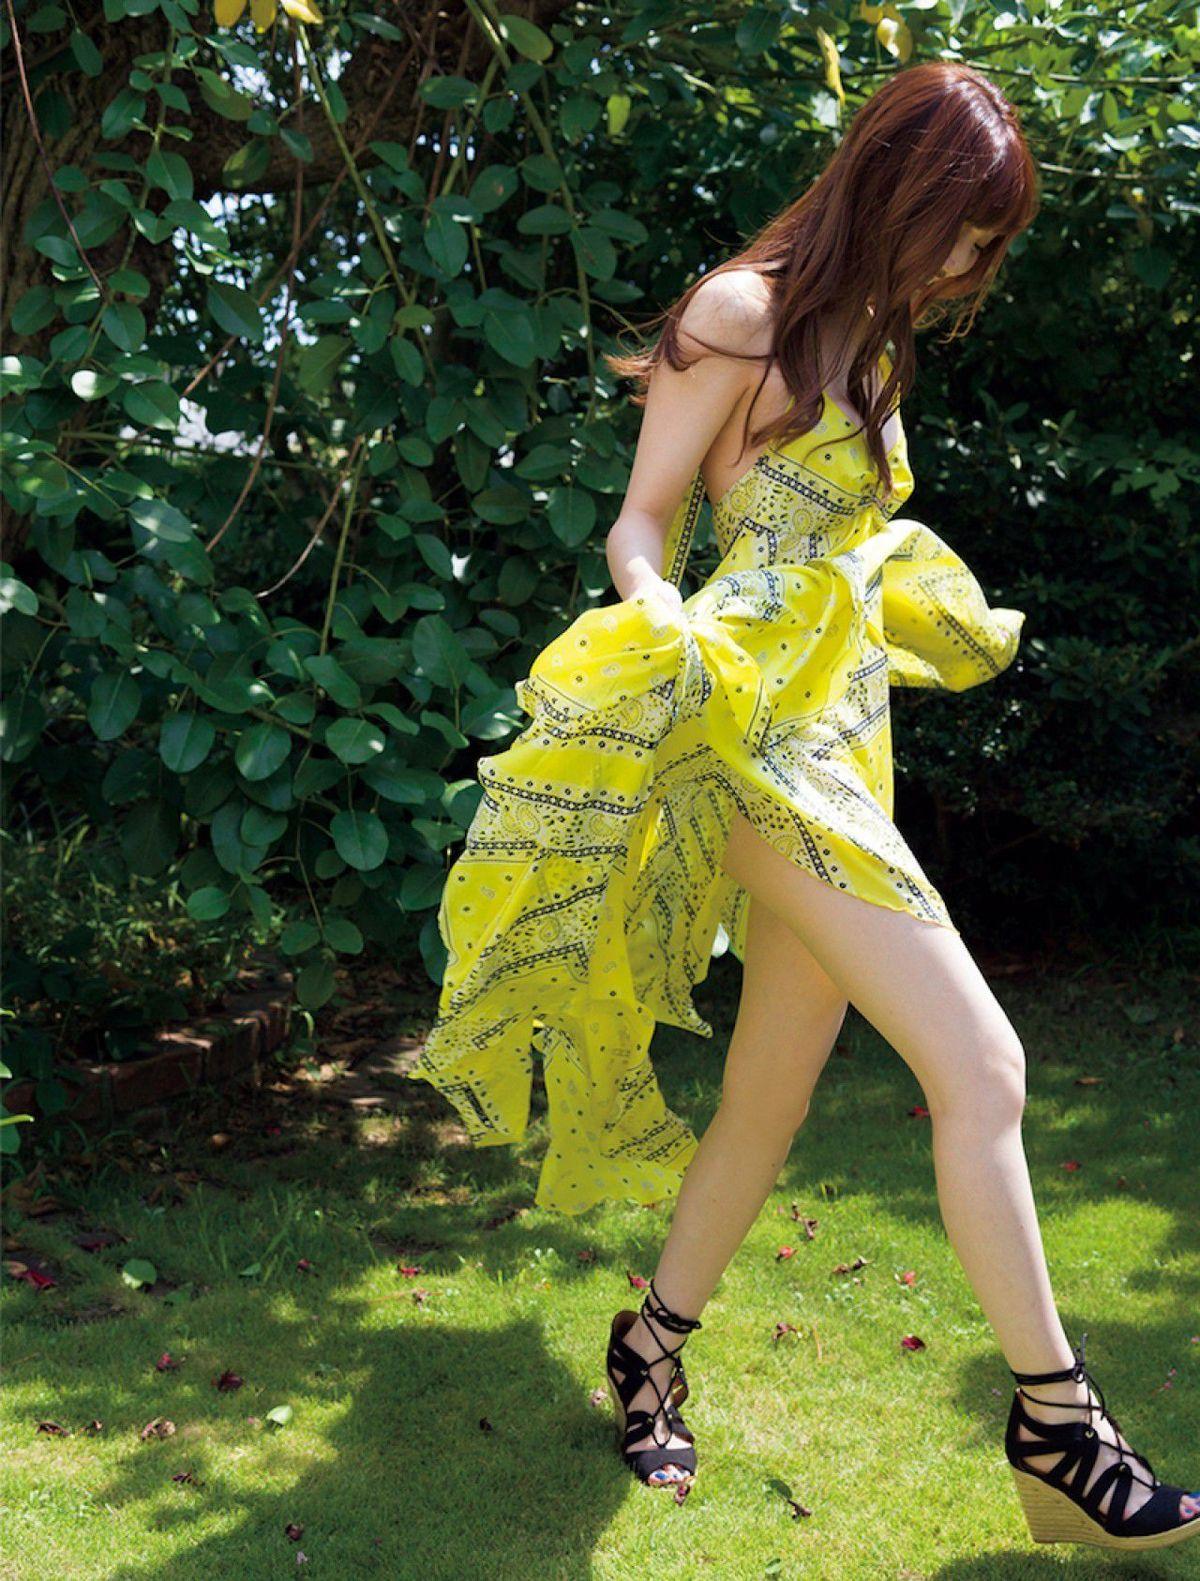 [FRIDAY] 松川菜々花 《人気モデルと水着デート キケンな二十歳の色香 (動画付き)》写真1